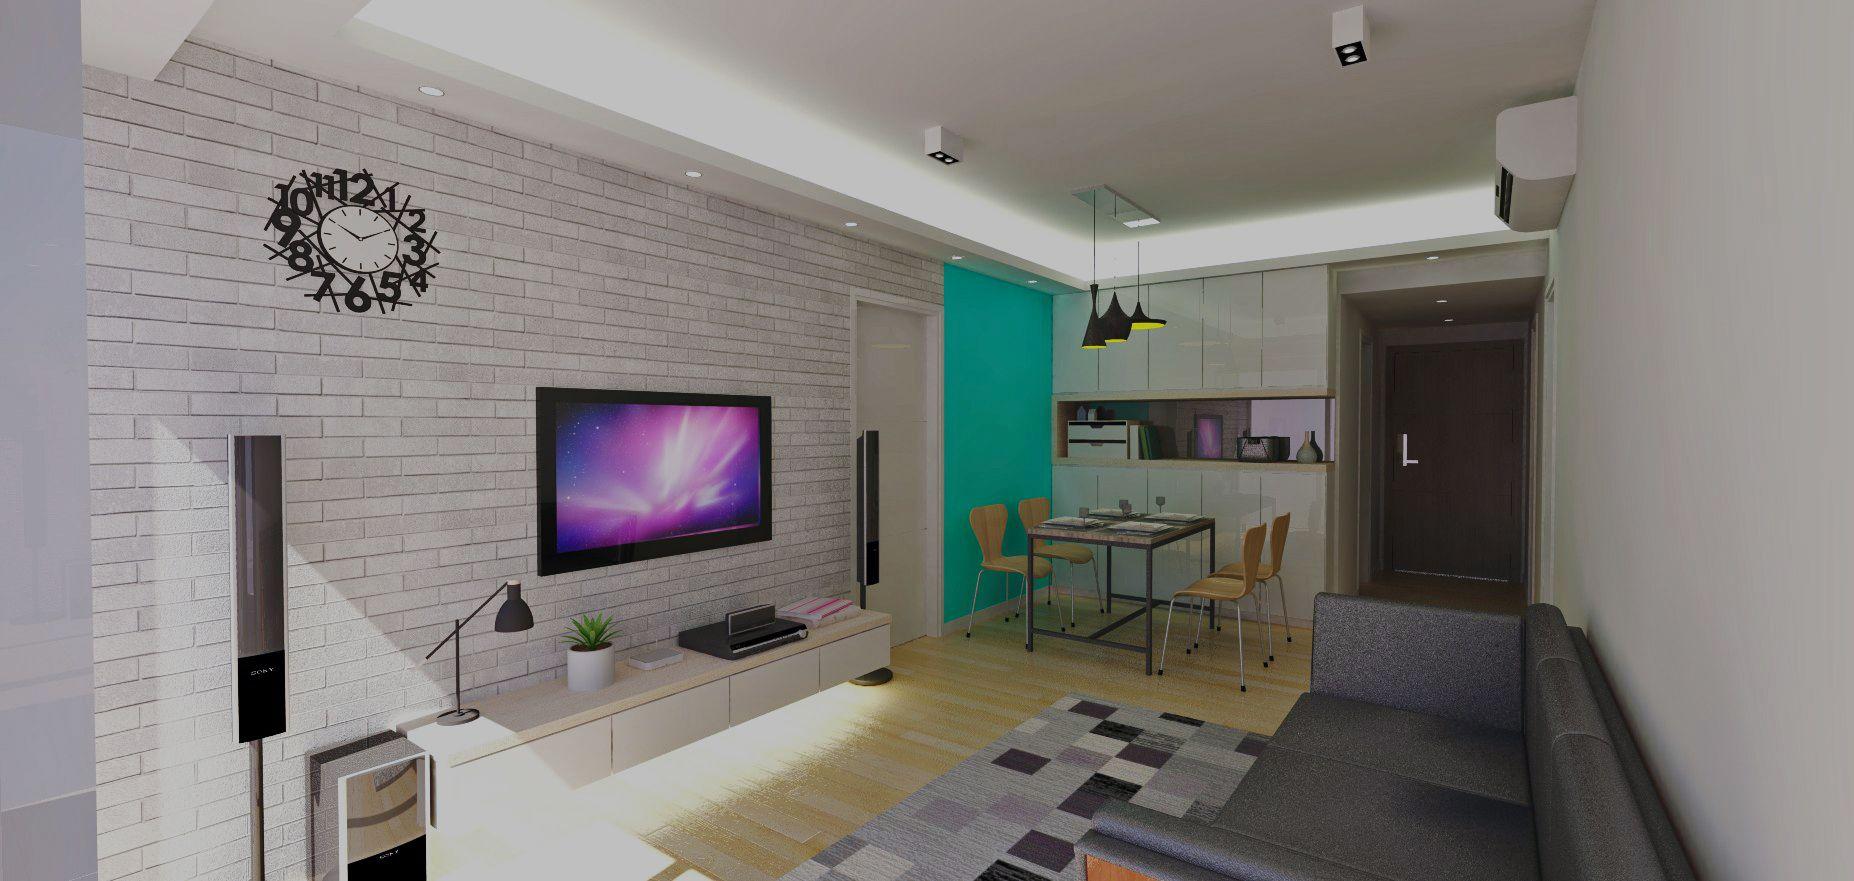 We Do Interior Design According To Your Individual Requirements Minimalist Home House Design Interior Design